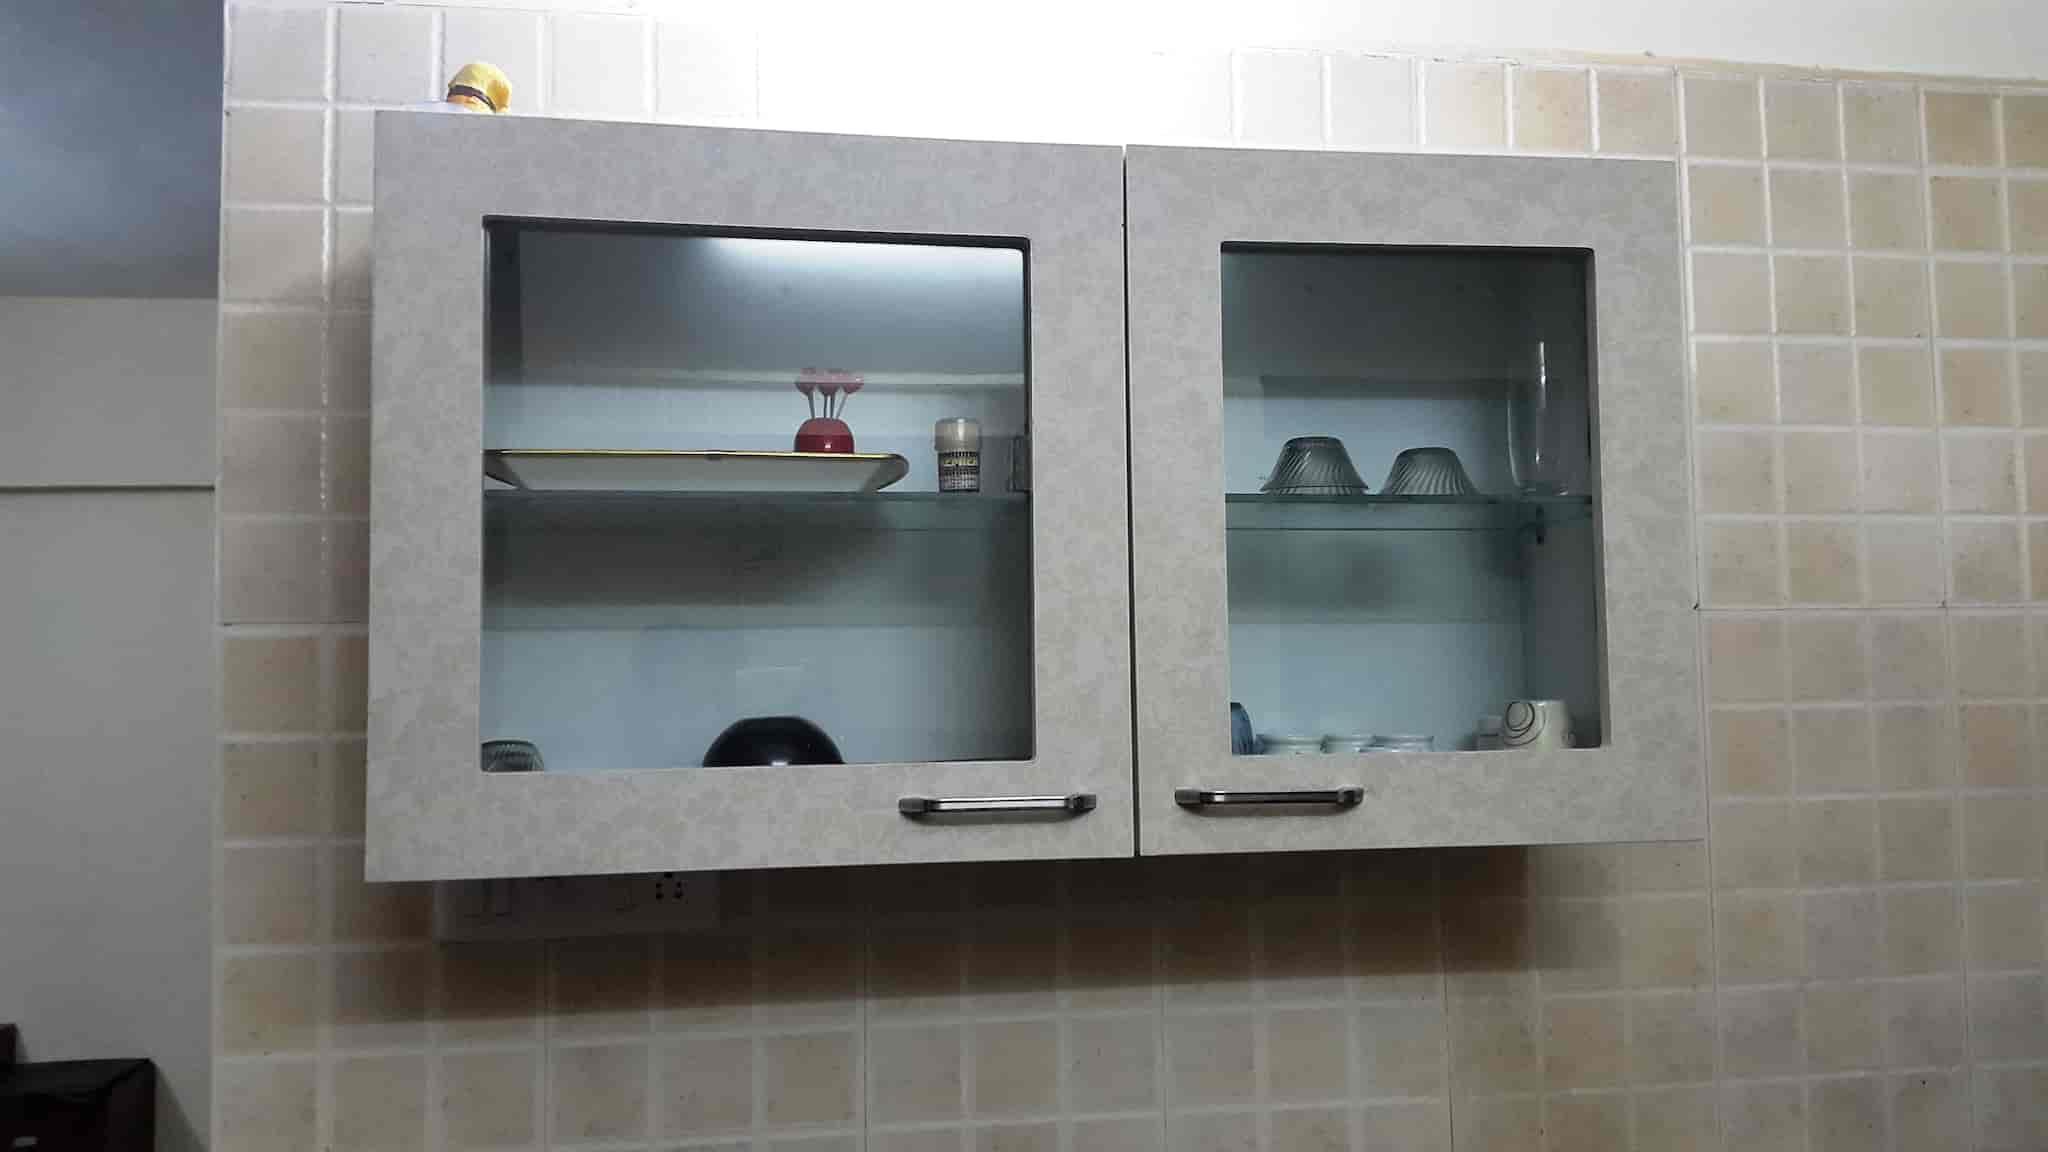 Mother Modular Kitchen And Interiors s Hotgi Road Solapur